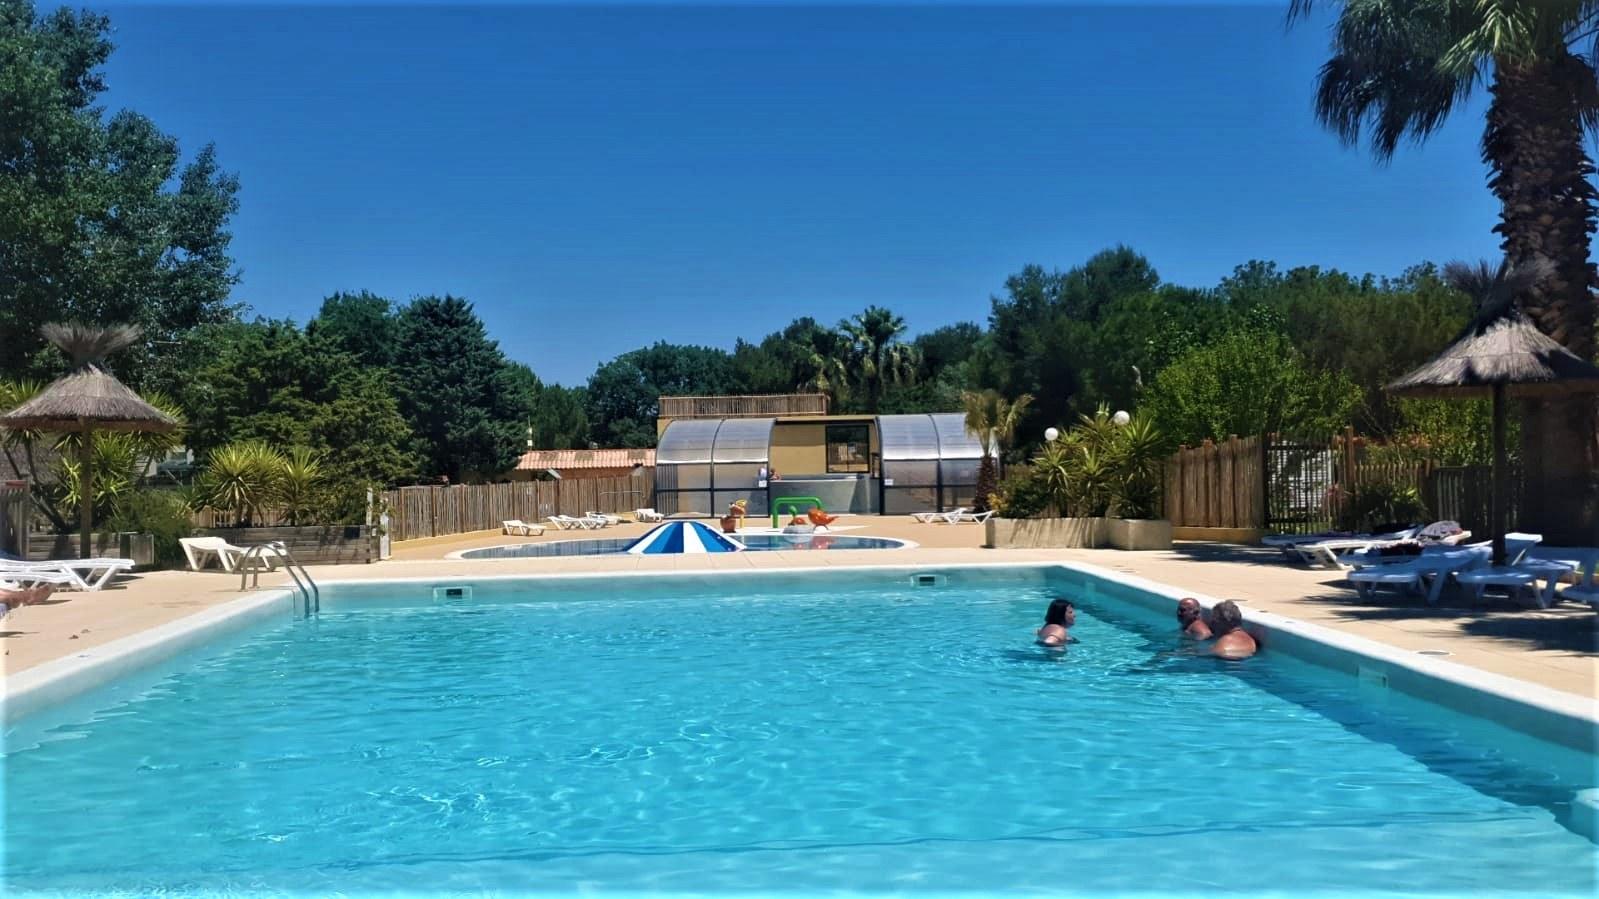 Piscine 2021 - camping familial meze plage piscine (13)